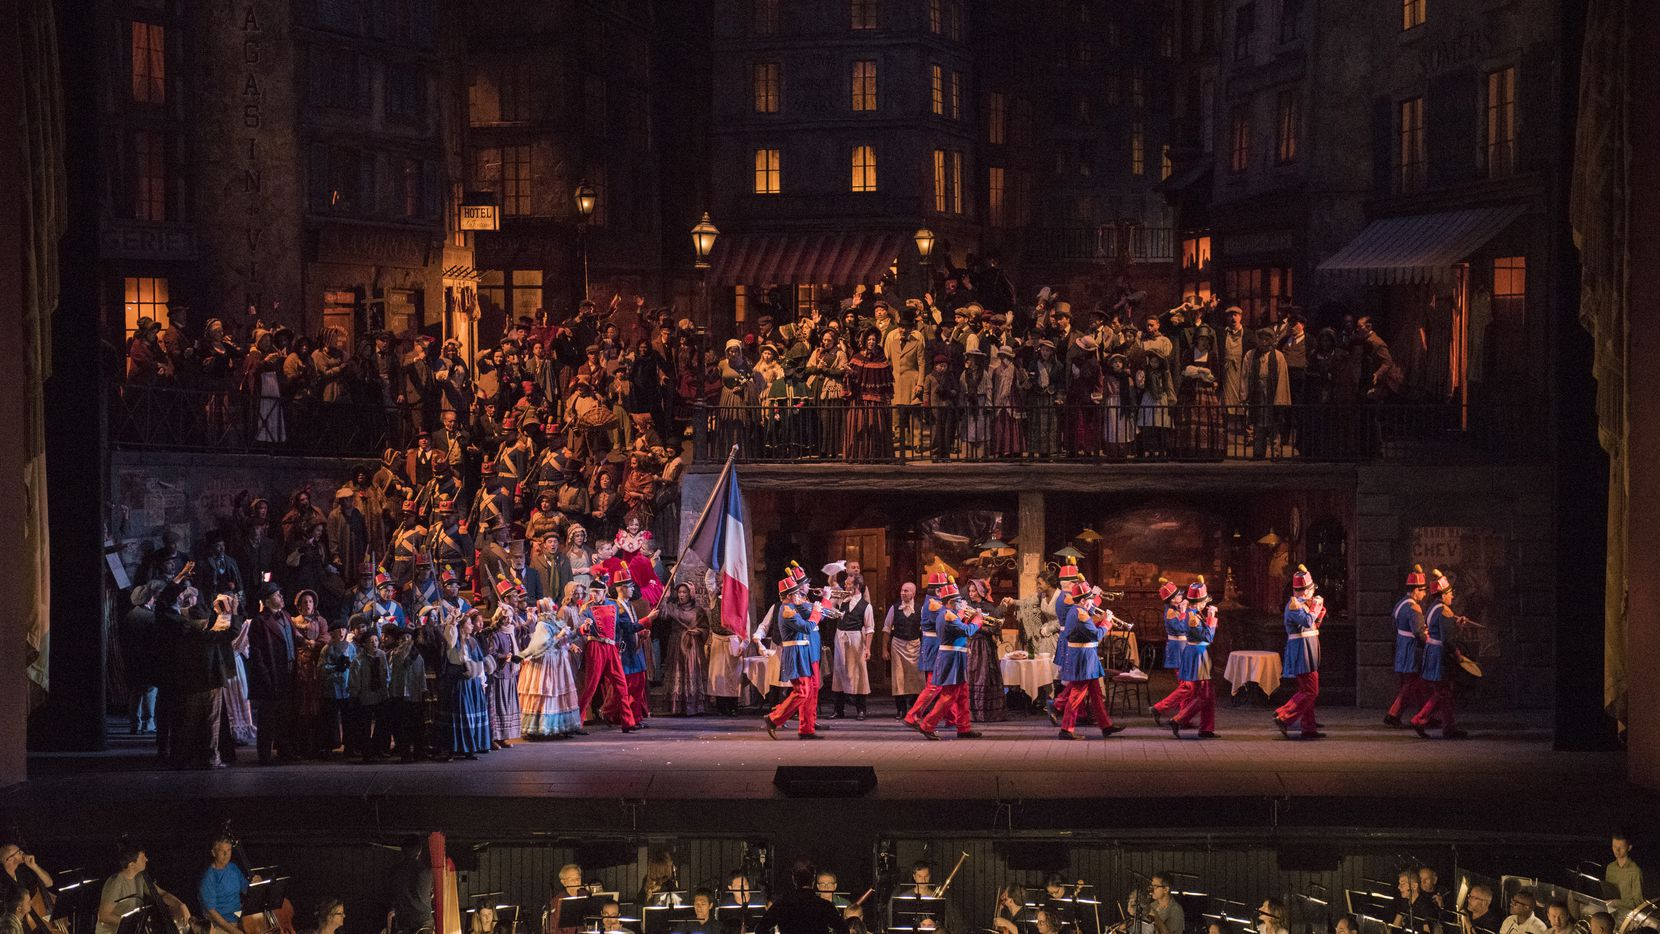 Fort Worth Opera will present the Metropolitan Opera's Feb. 24, 2018 performance of Puccini's 'La bohème' at Coyote Drive-In.